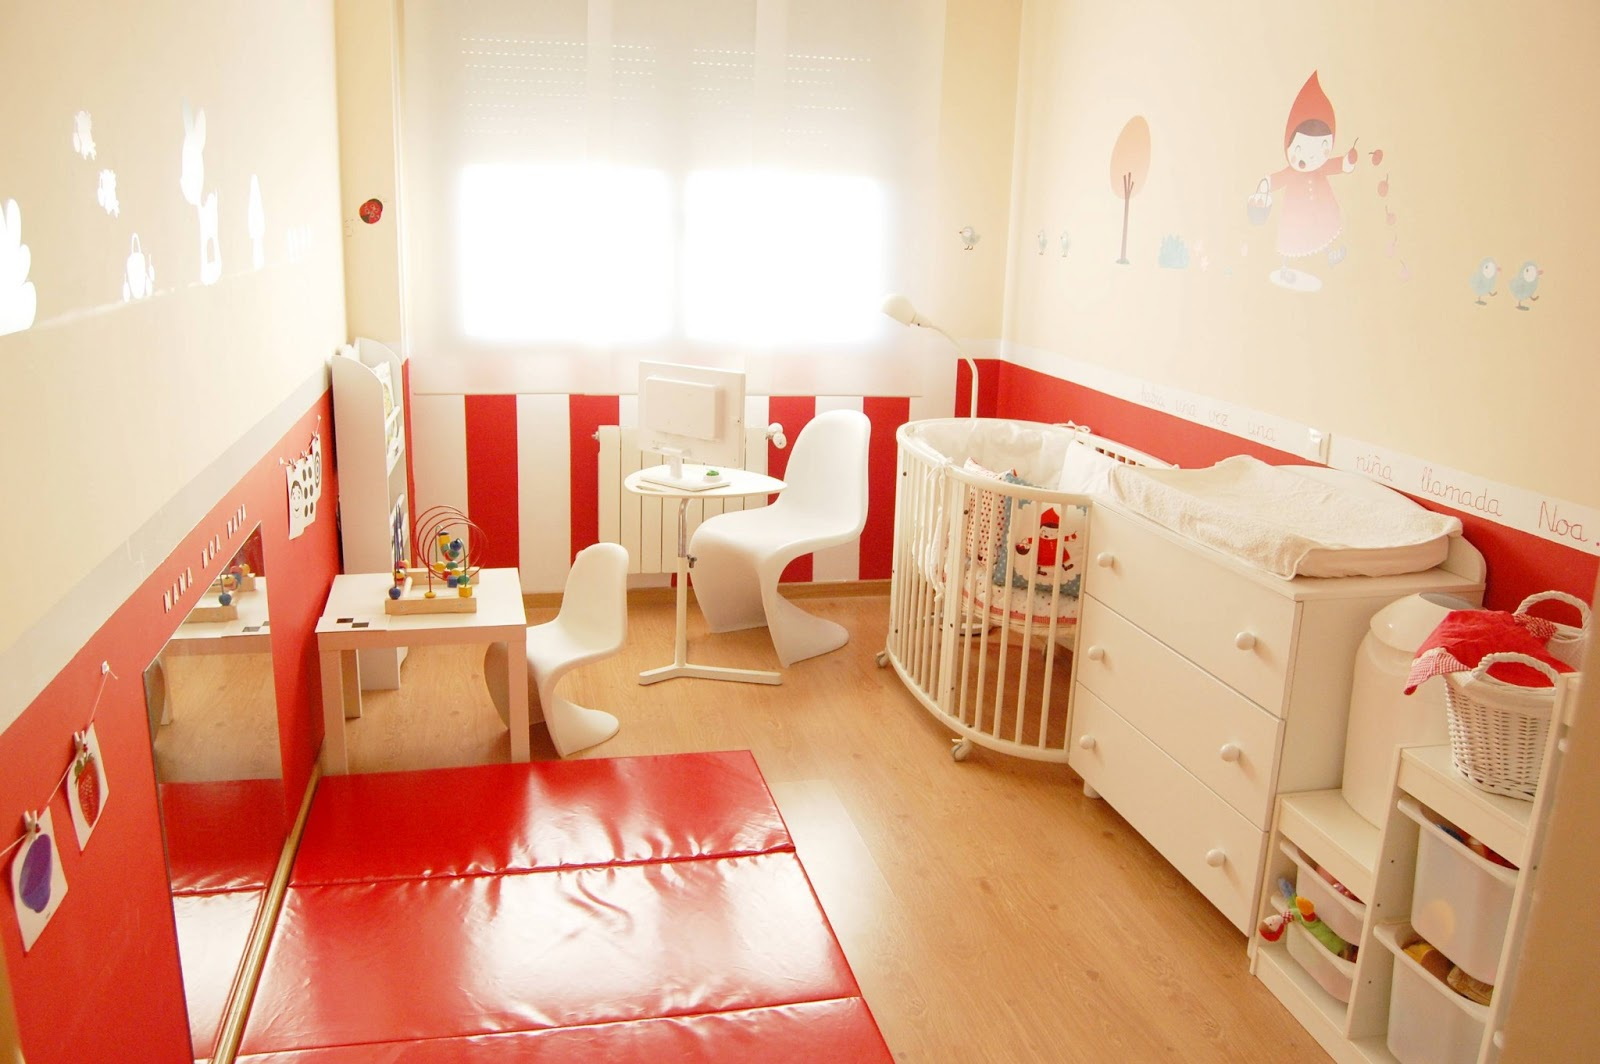 Mam de noa habitaci n de beb decorada en rojo Disenar habitacion ikea